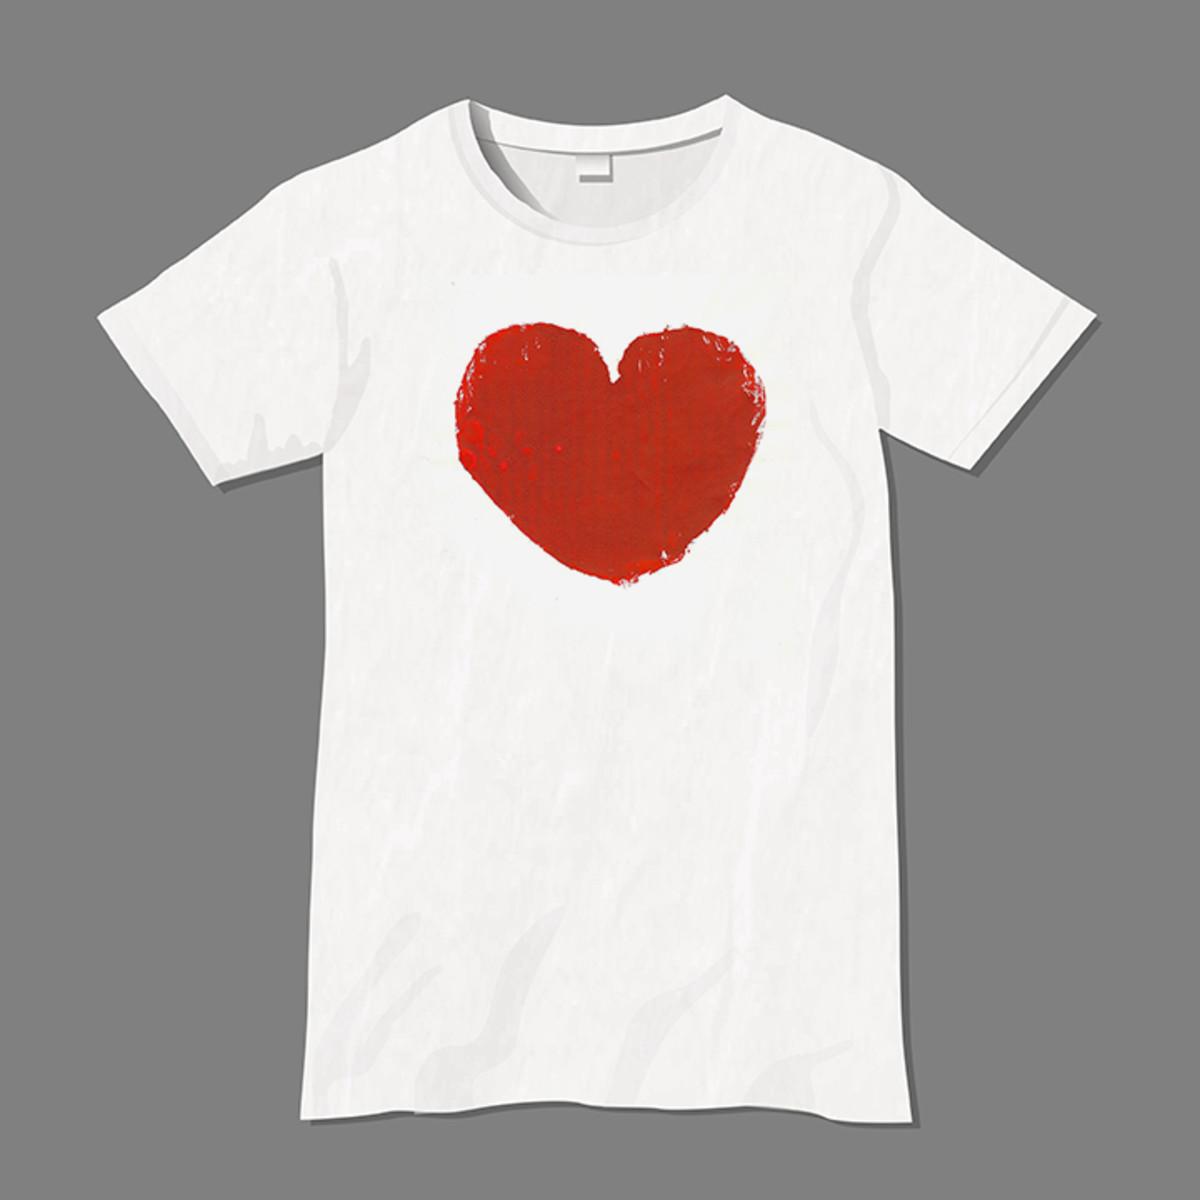 Cardboard block print T-shirt.